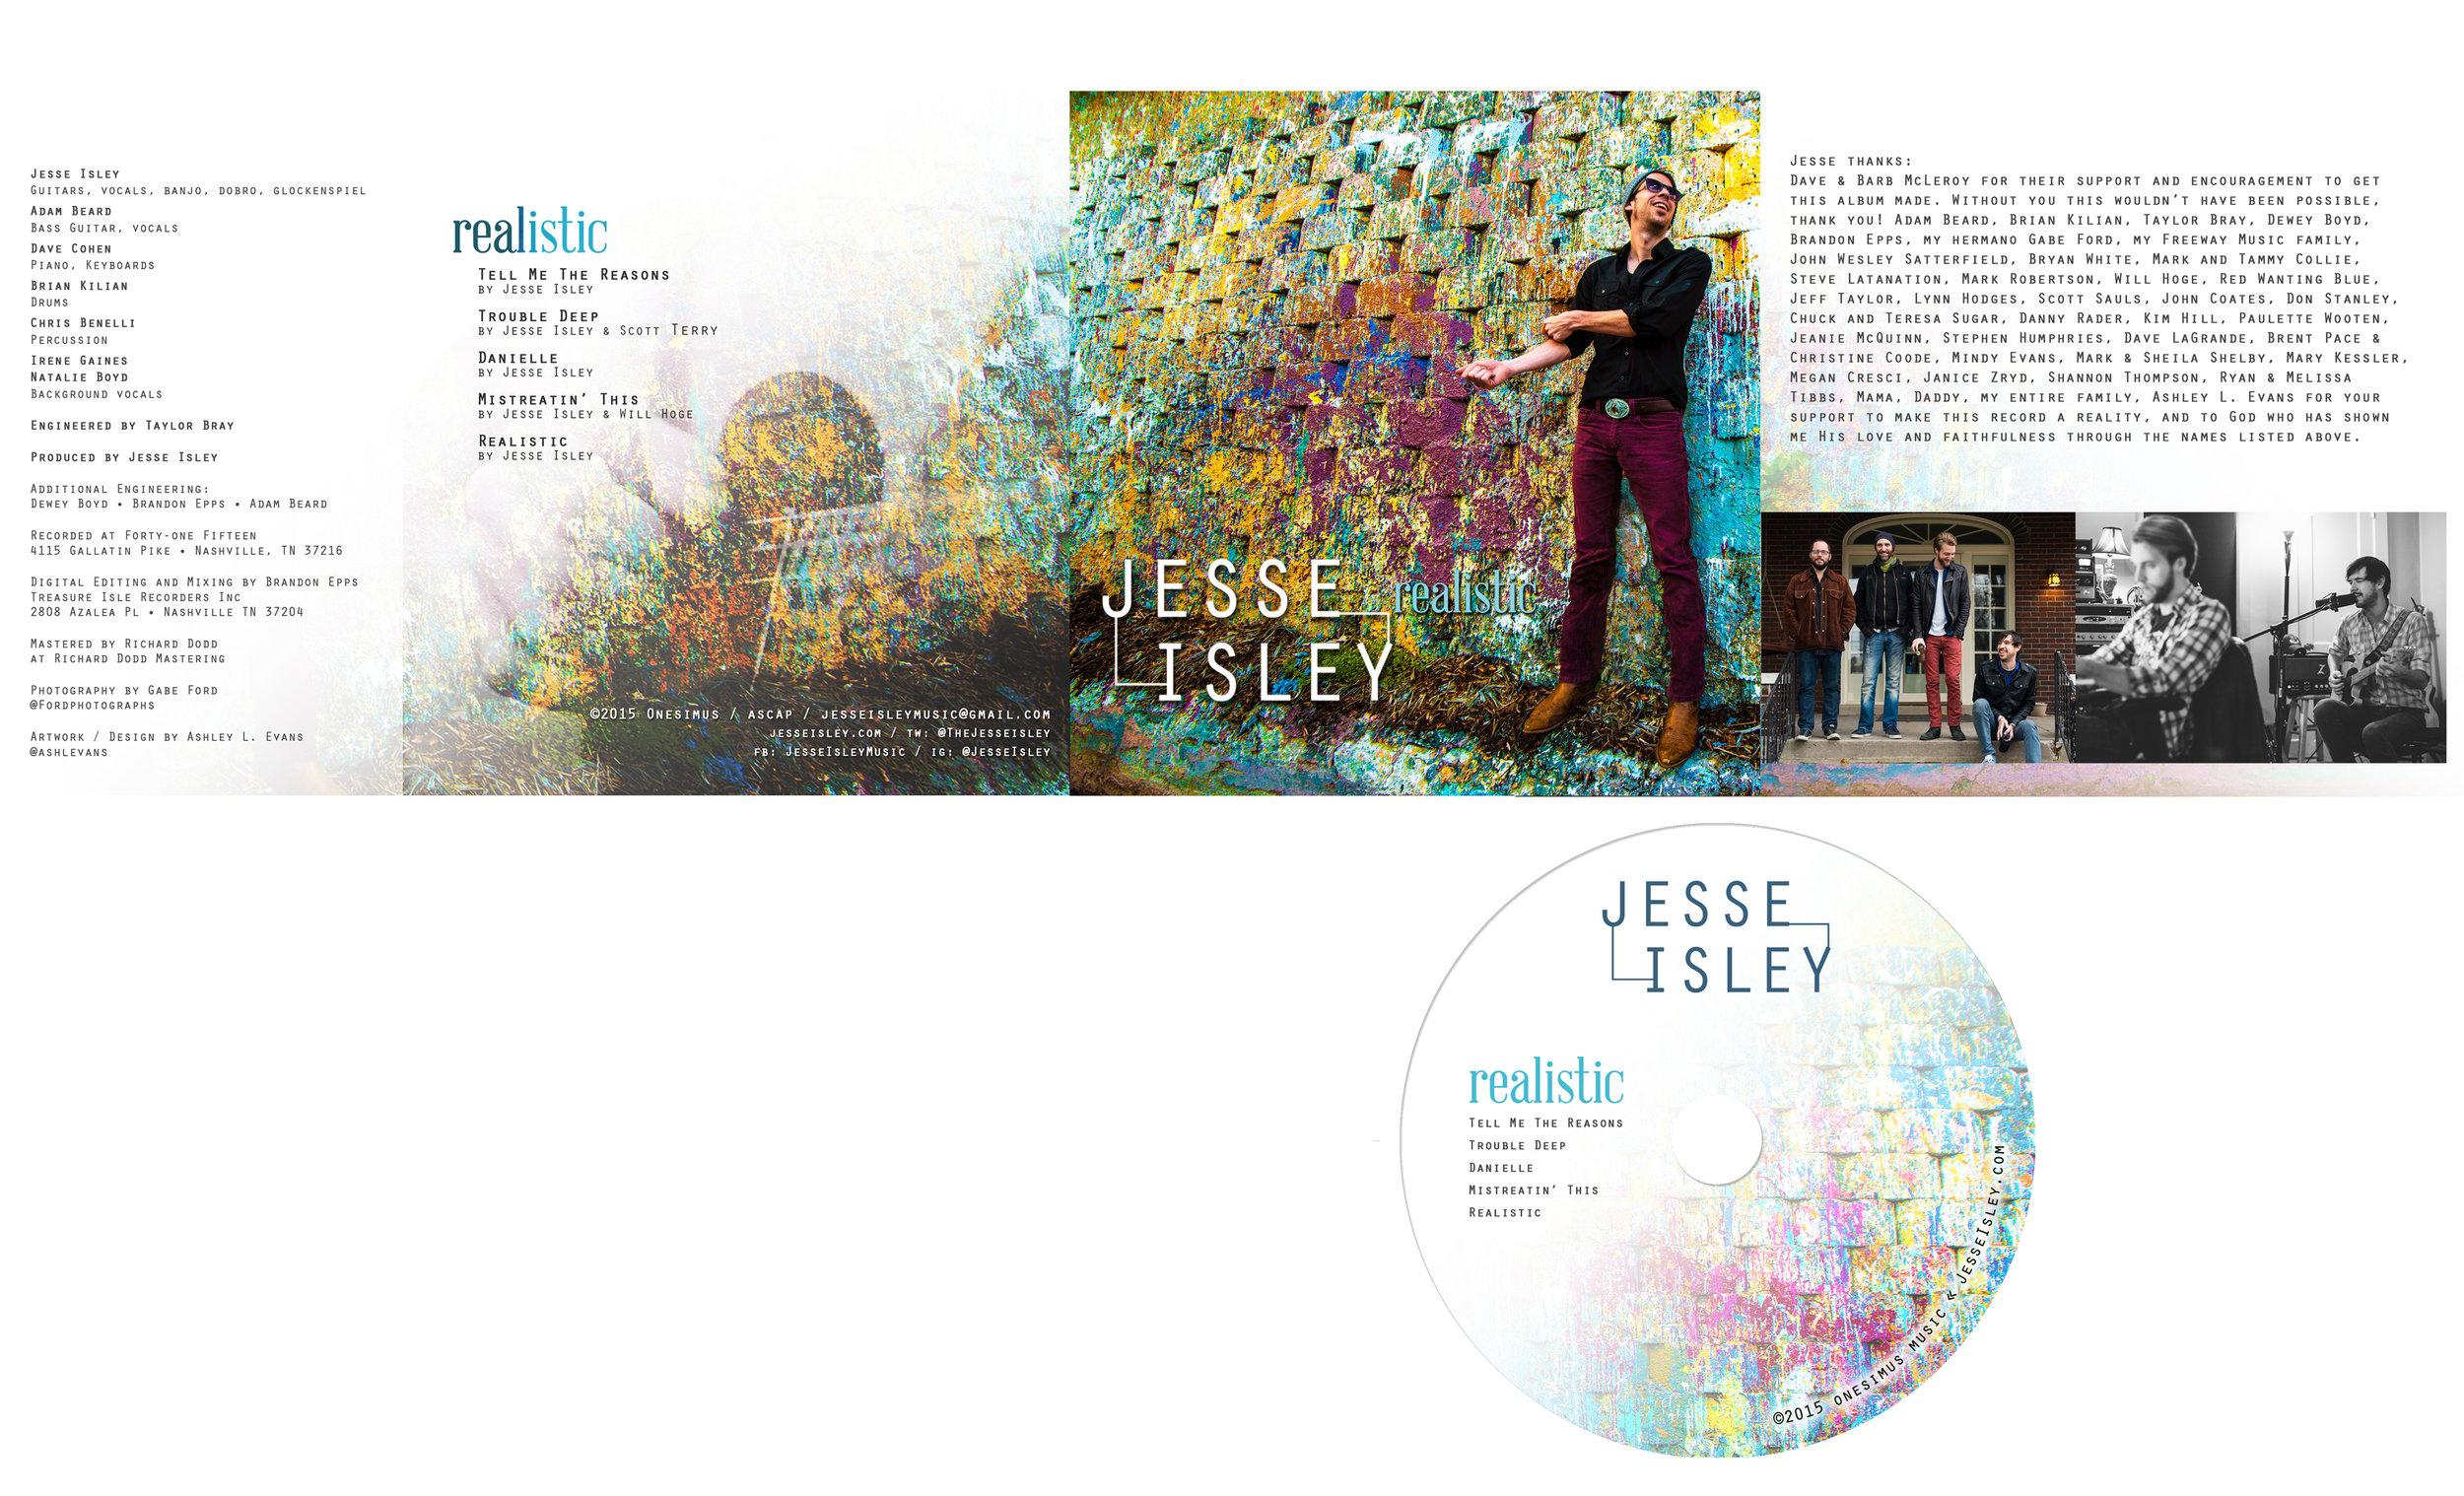 Jesse Isley - Album Design 1.jpg